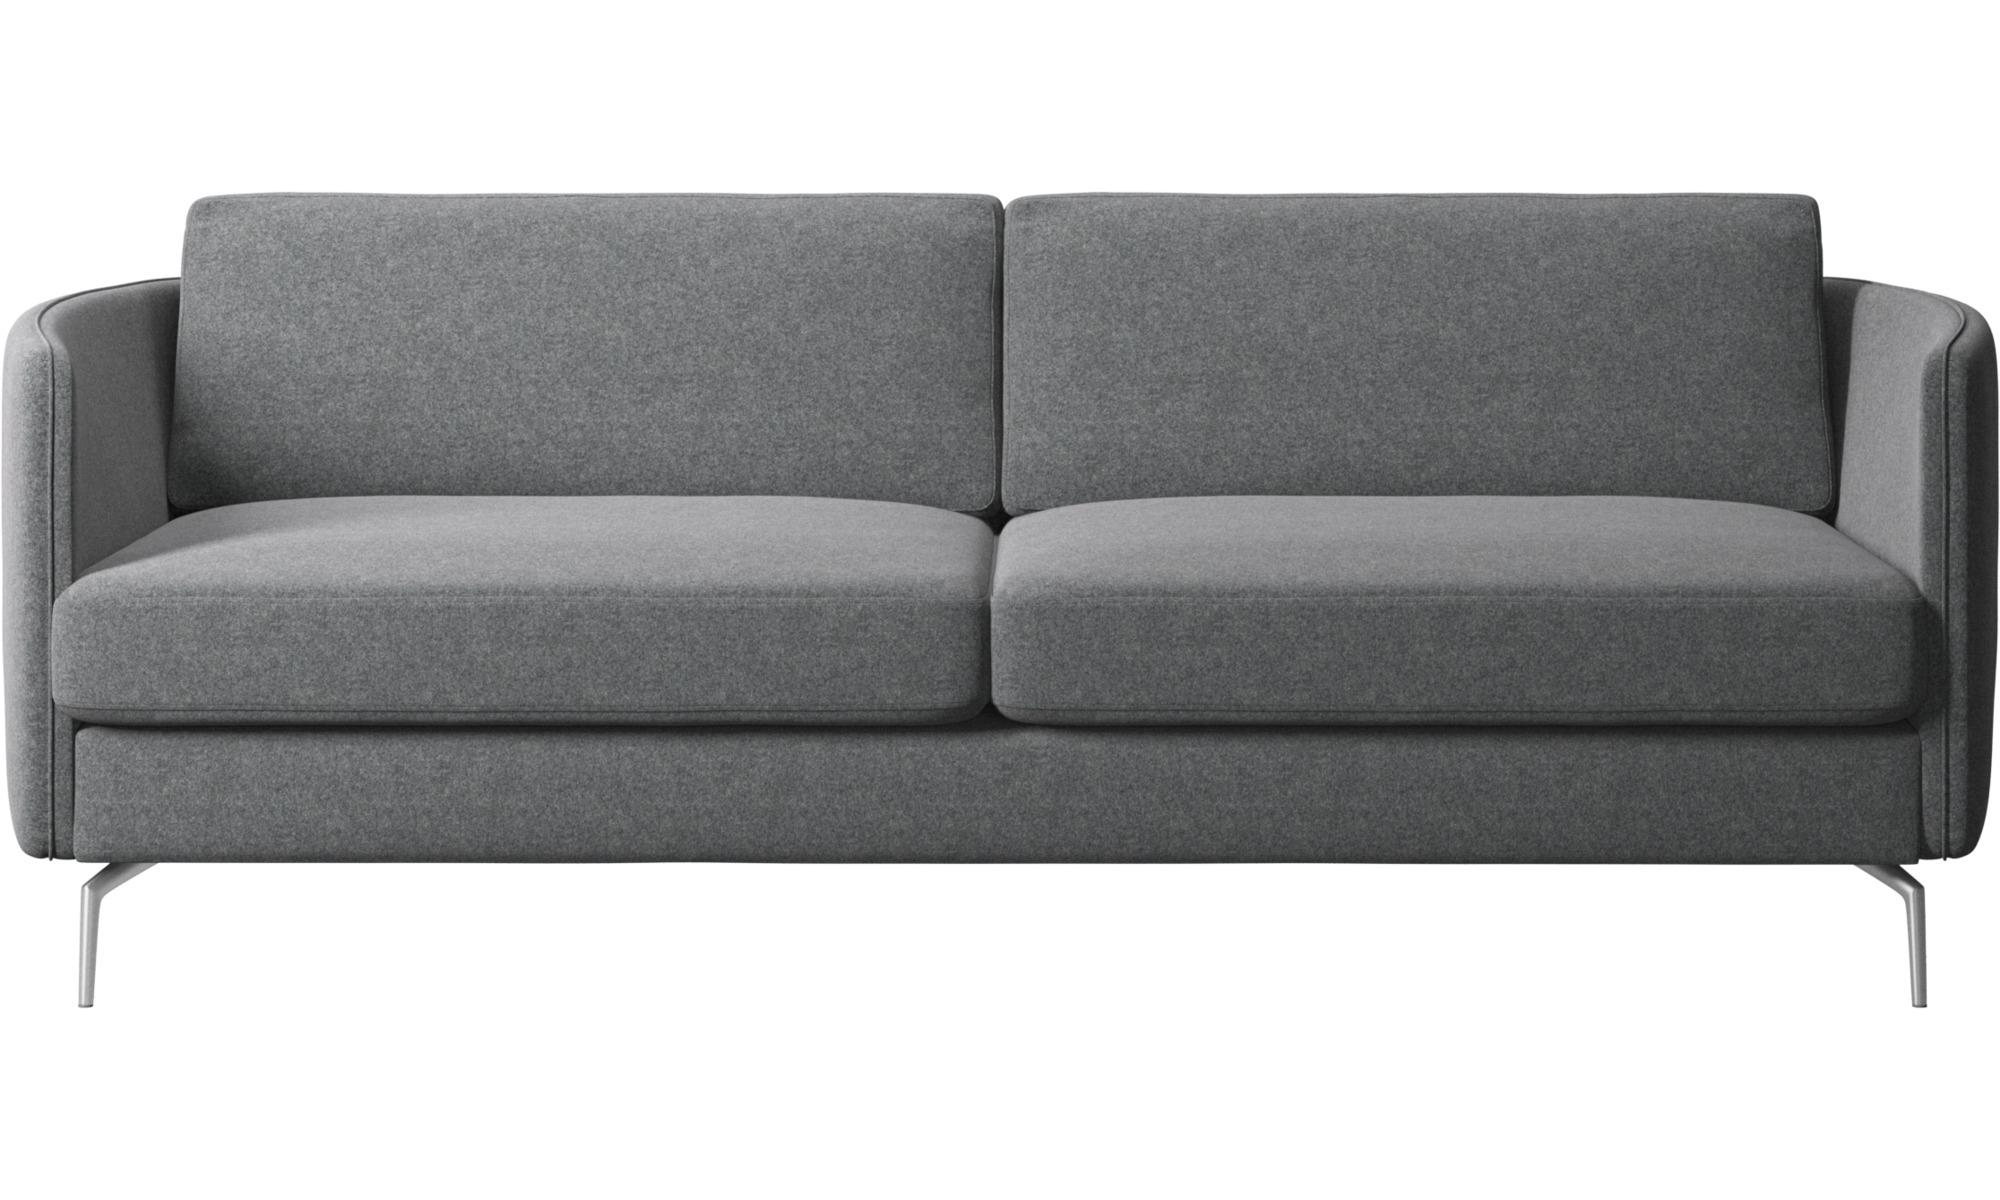 2 5 Seater Sofas Osaka Sofa Regular